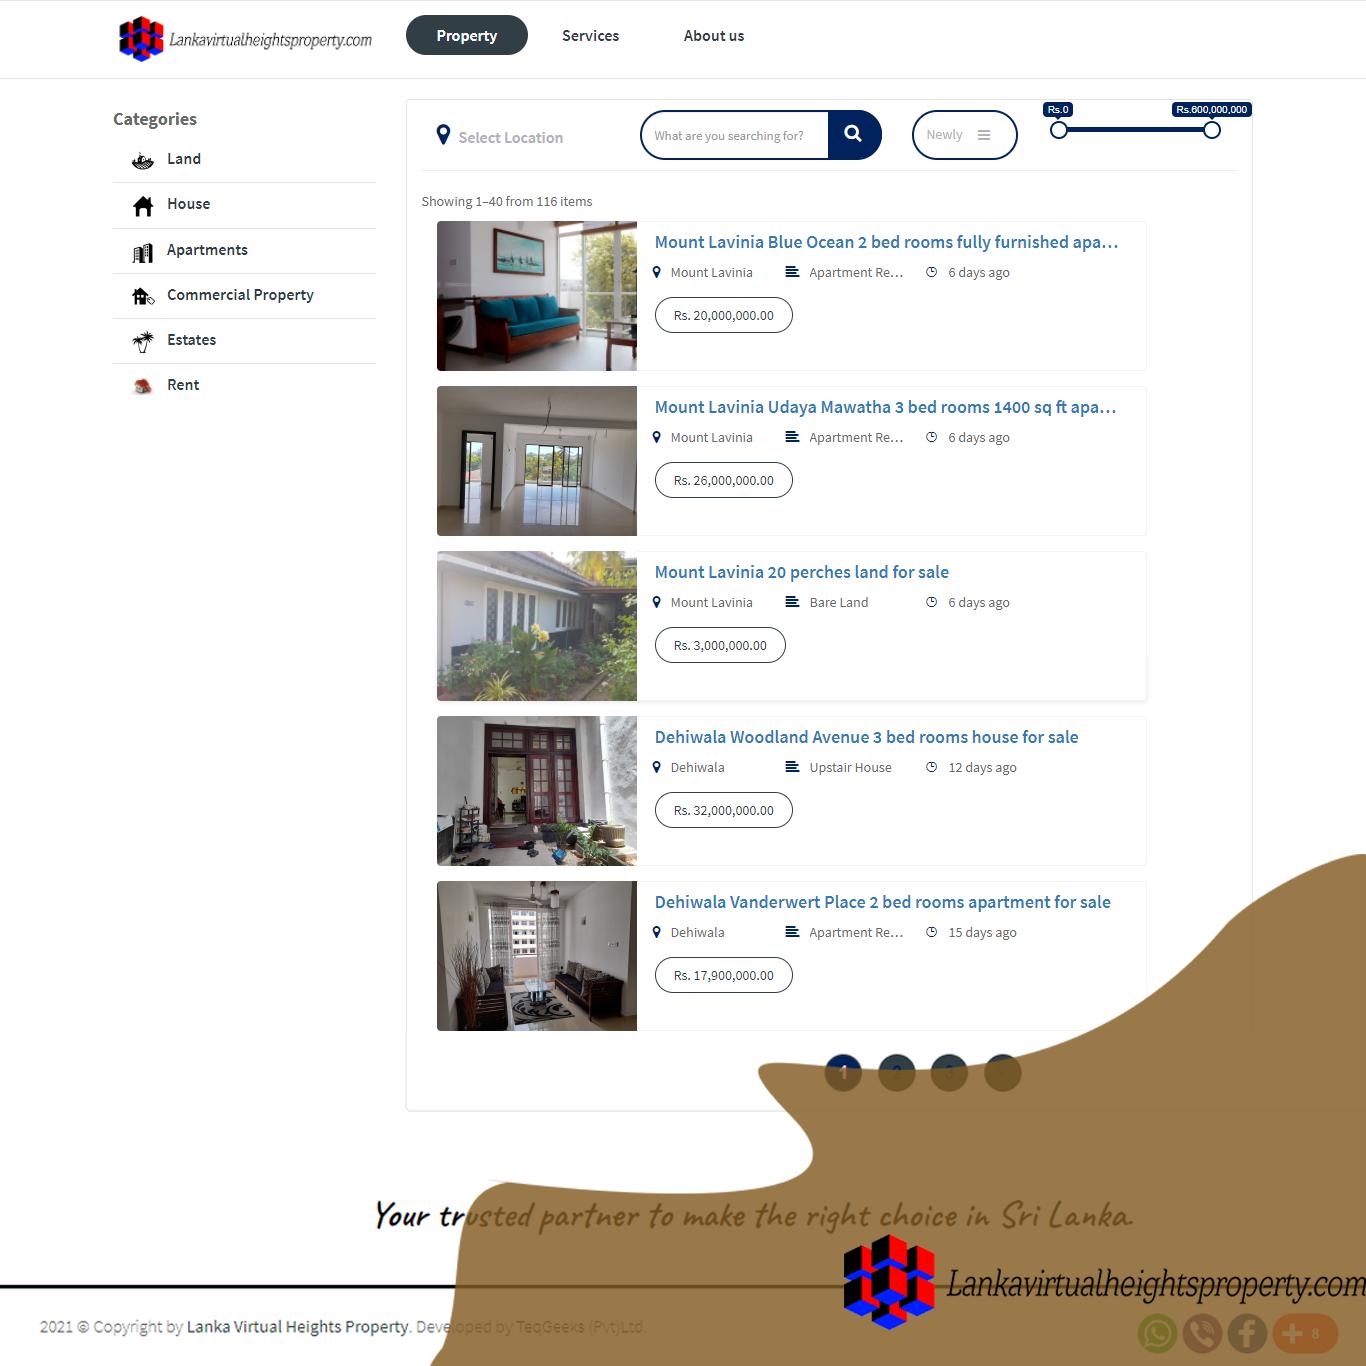 Lanka Virtual Heights Property